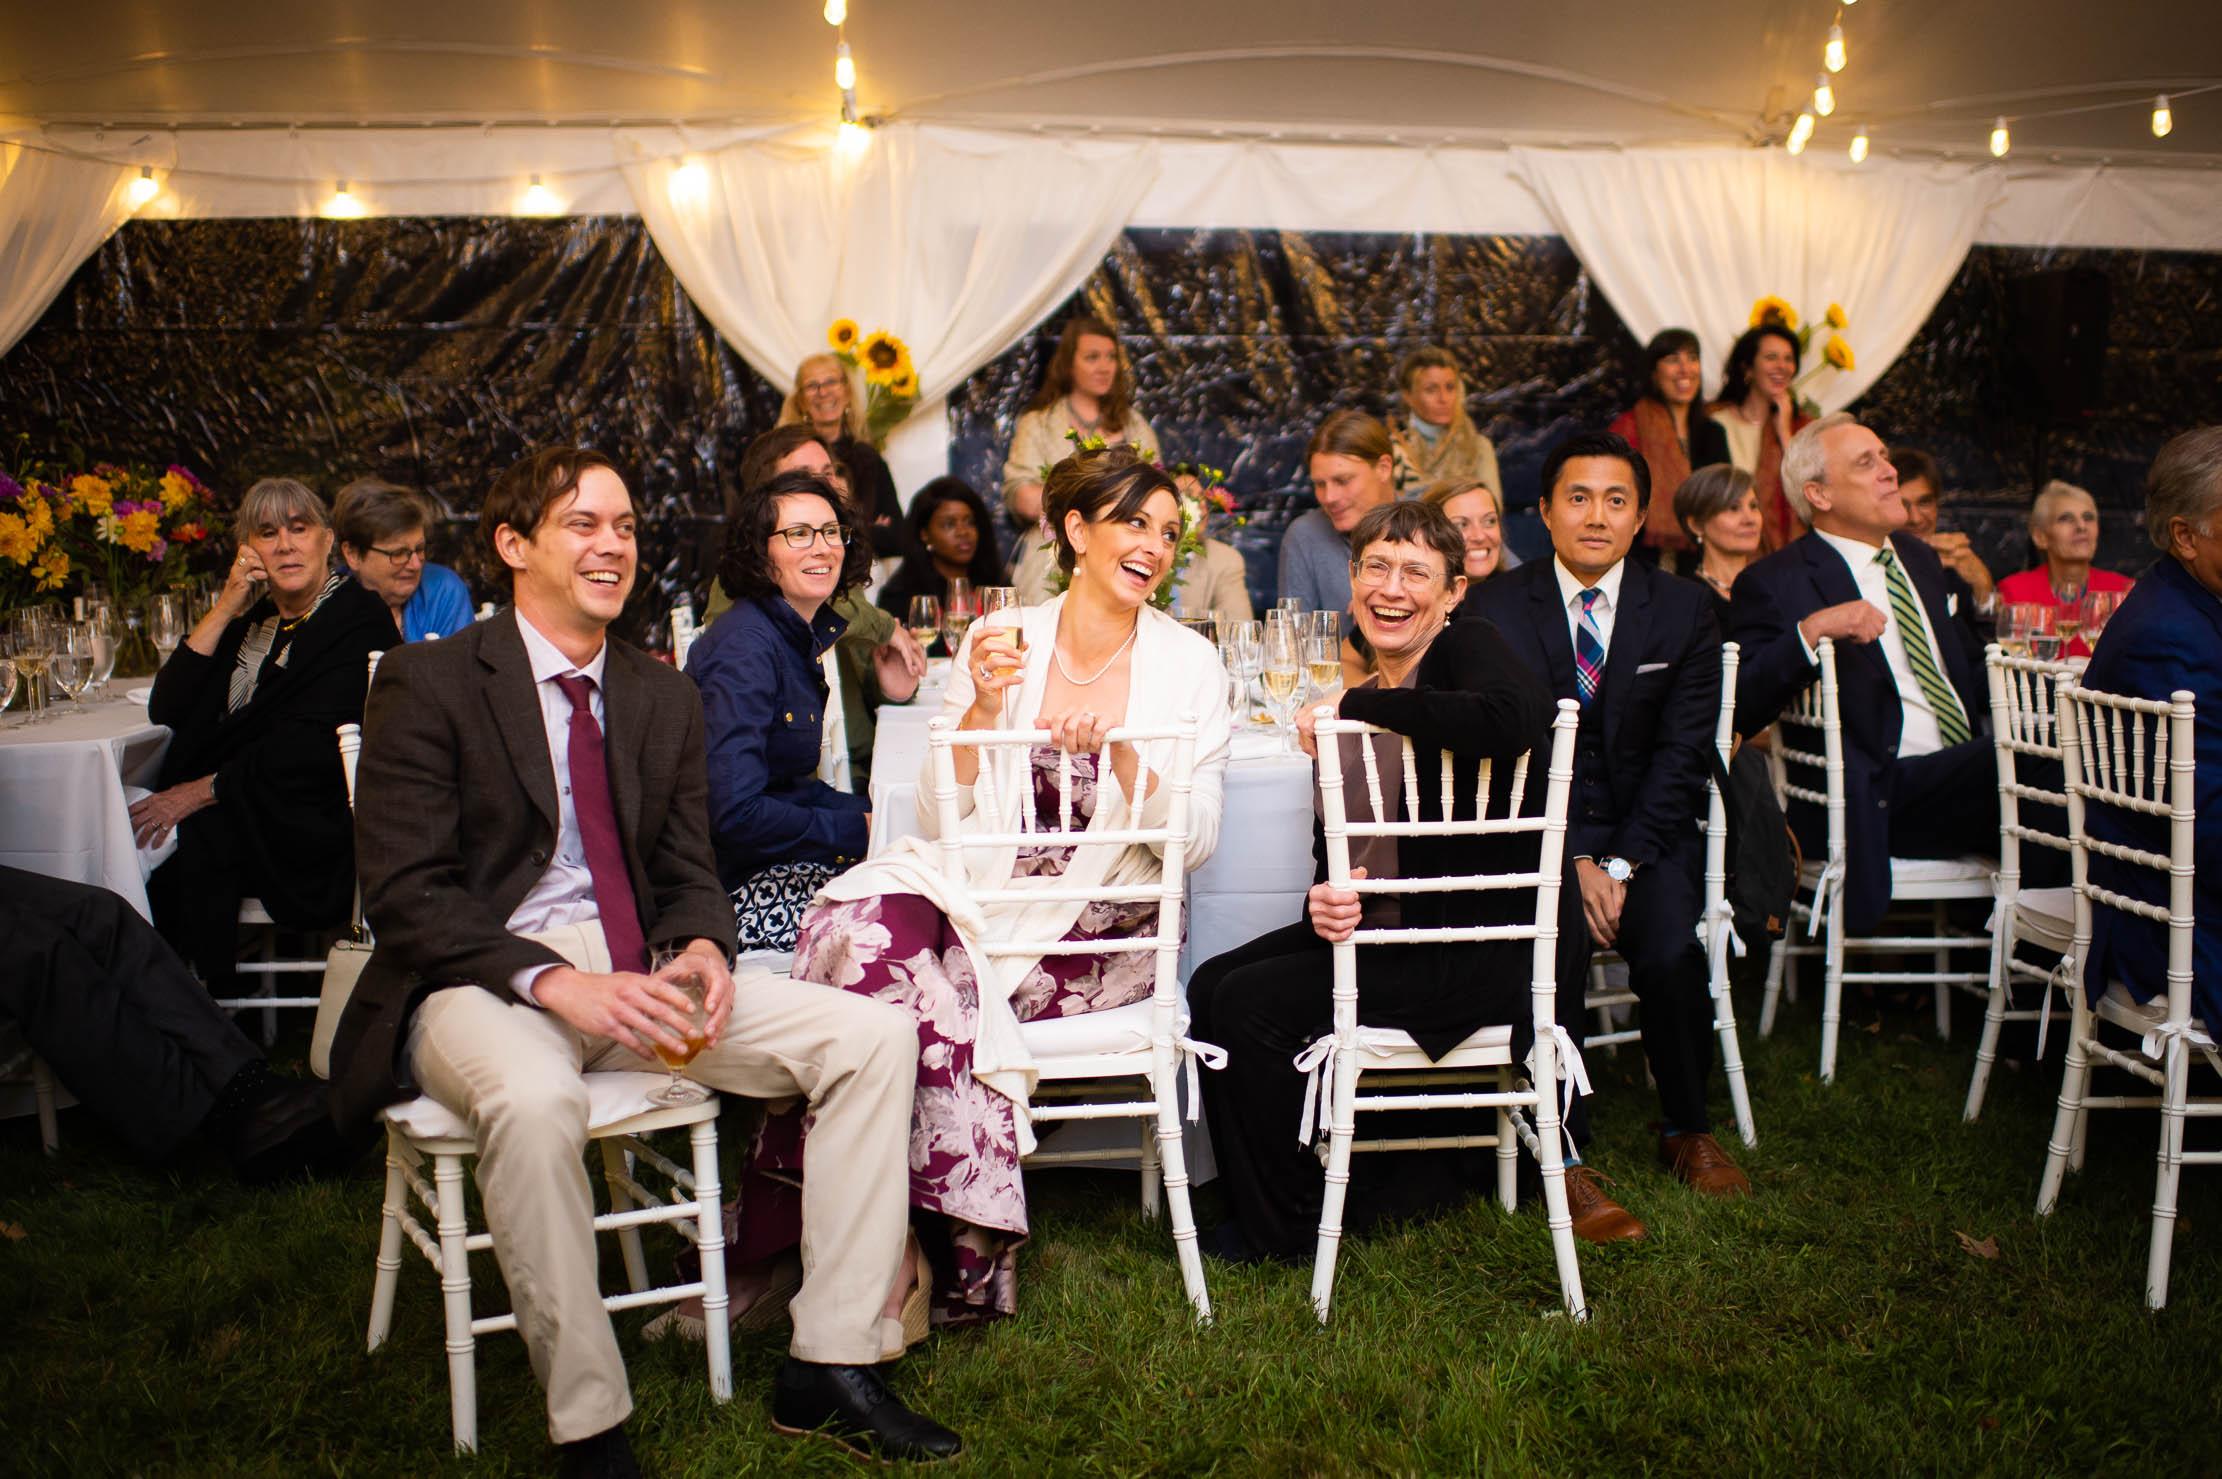 Wings-Castle-Millbrook-NY-Upstate-Wedding-Photographer-1142.jpg